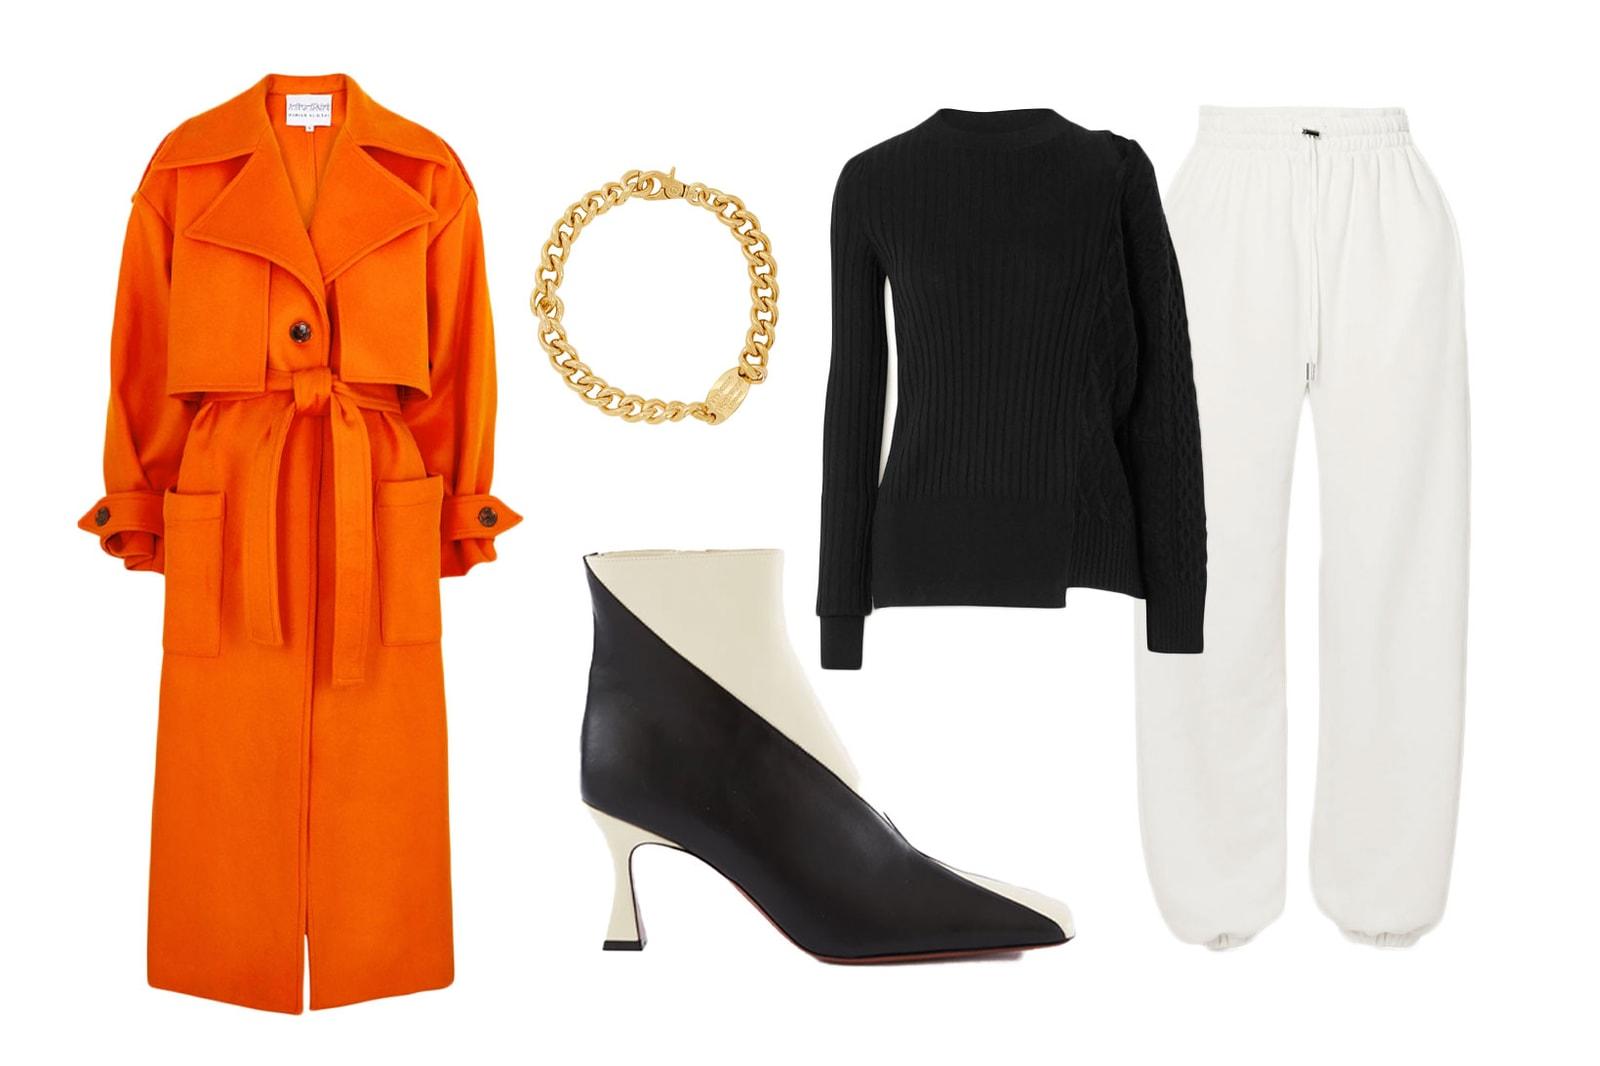 tracksuit styling editors guide outfit frankie shop sweatpants sacai knit sweater orange coat